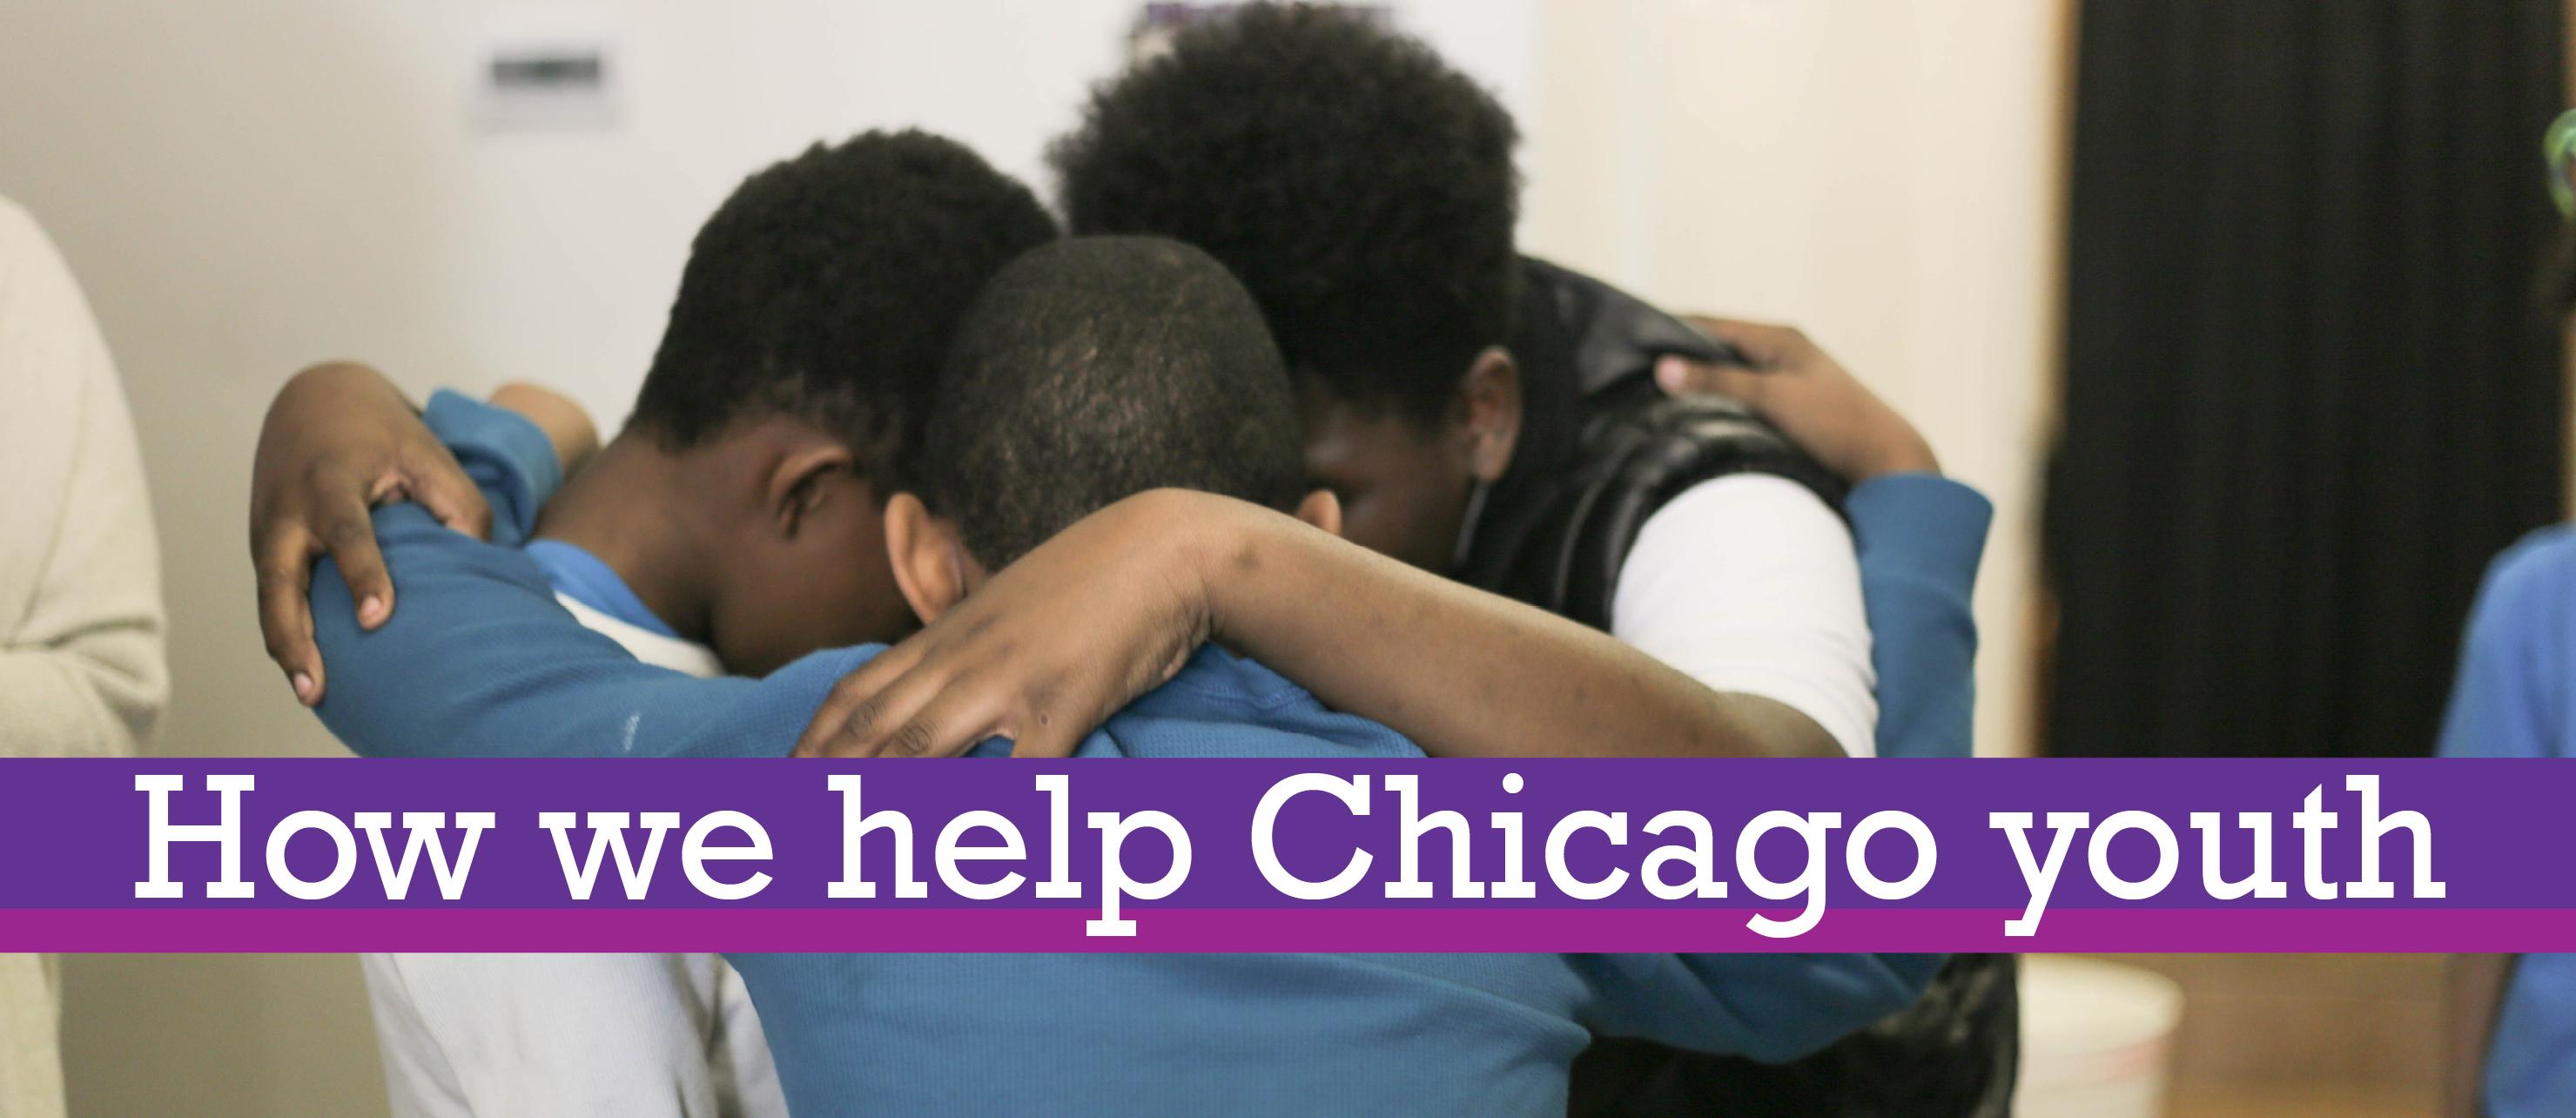 Kaleidoscope 4 Kids - Homepage Slider - Programs Services Children Youth Chicago